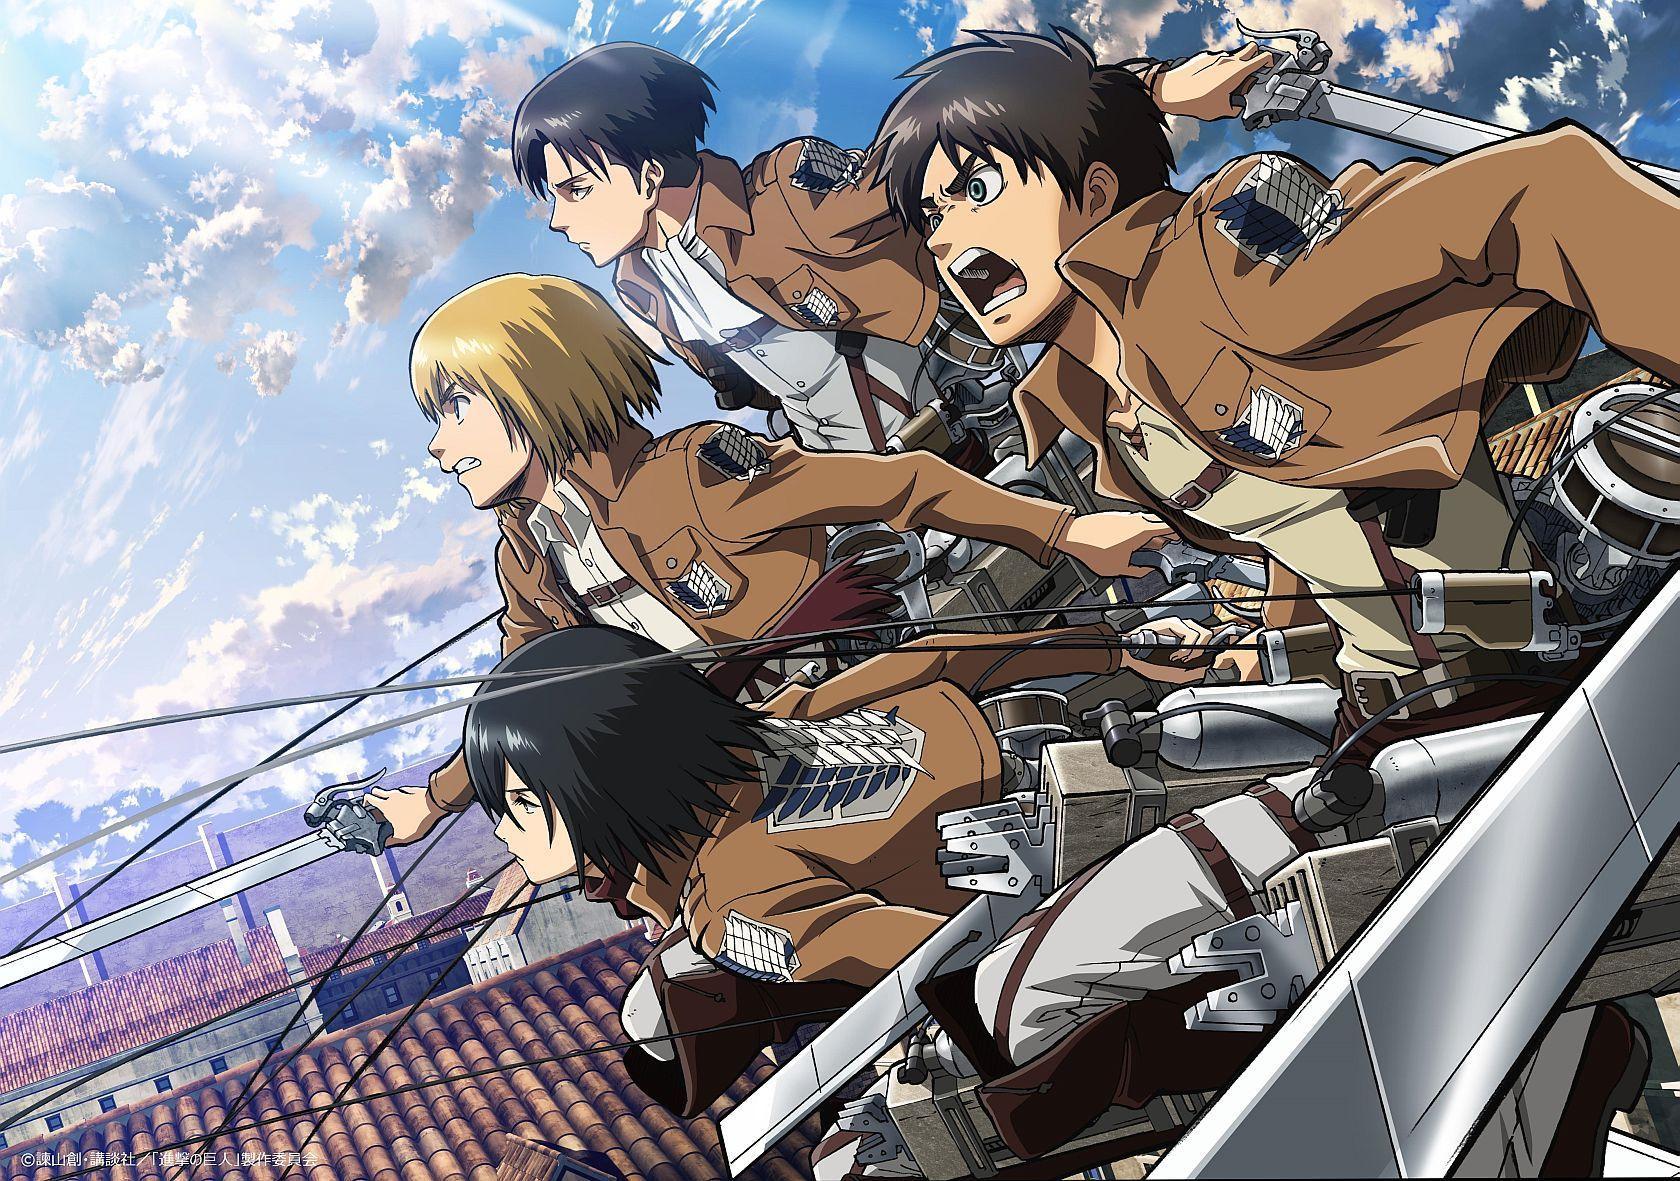 Attack On Titan Eren And Mikasa Wallpapers Top Free Attack On Titan Eren And Mikasa Backgrounds Wallpaperaccess